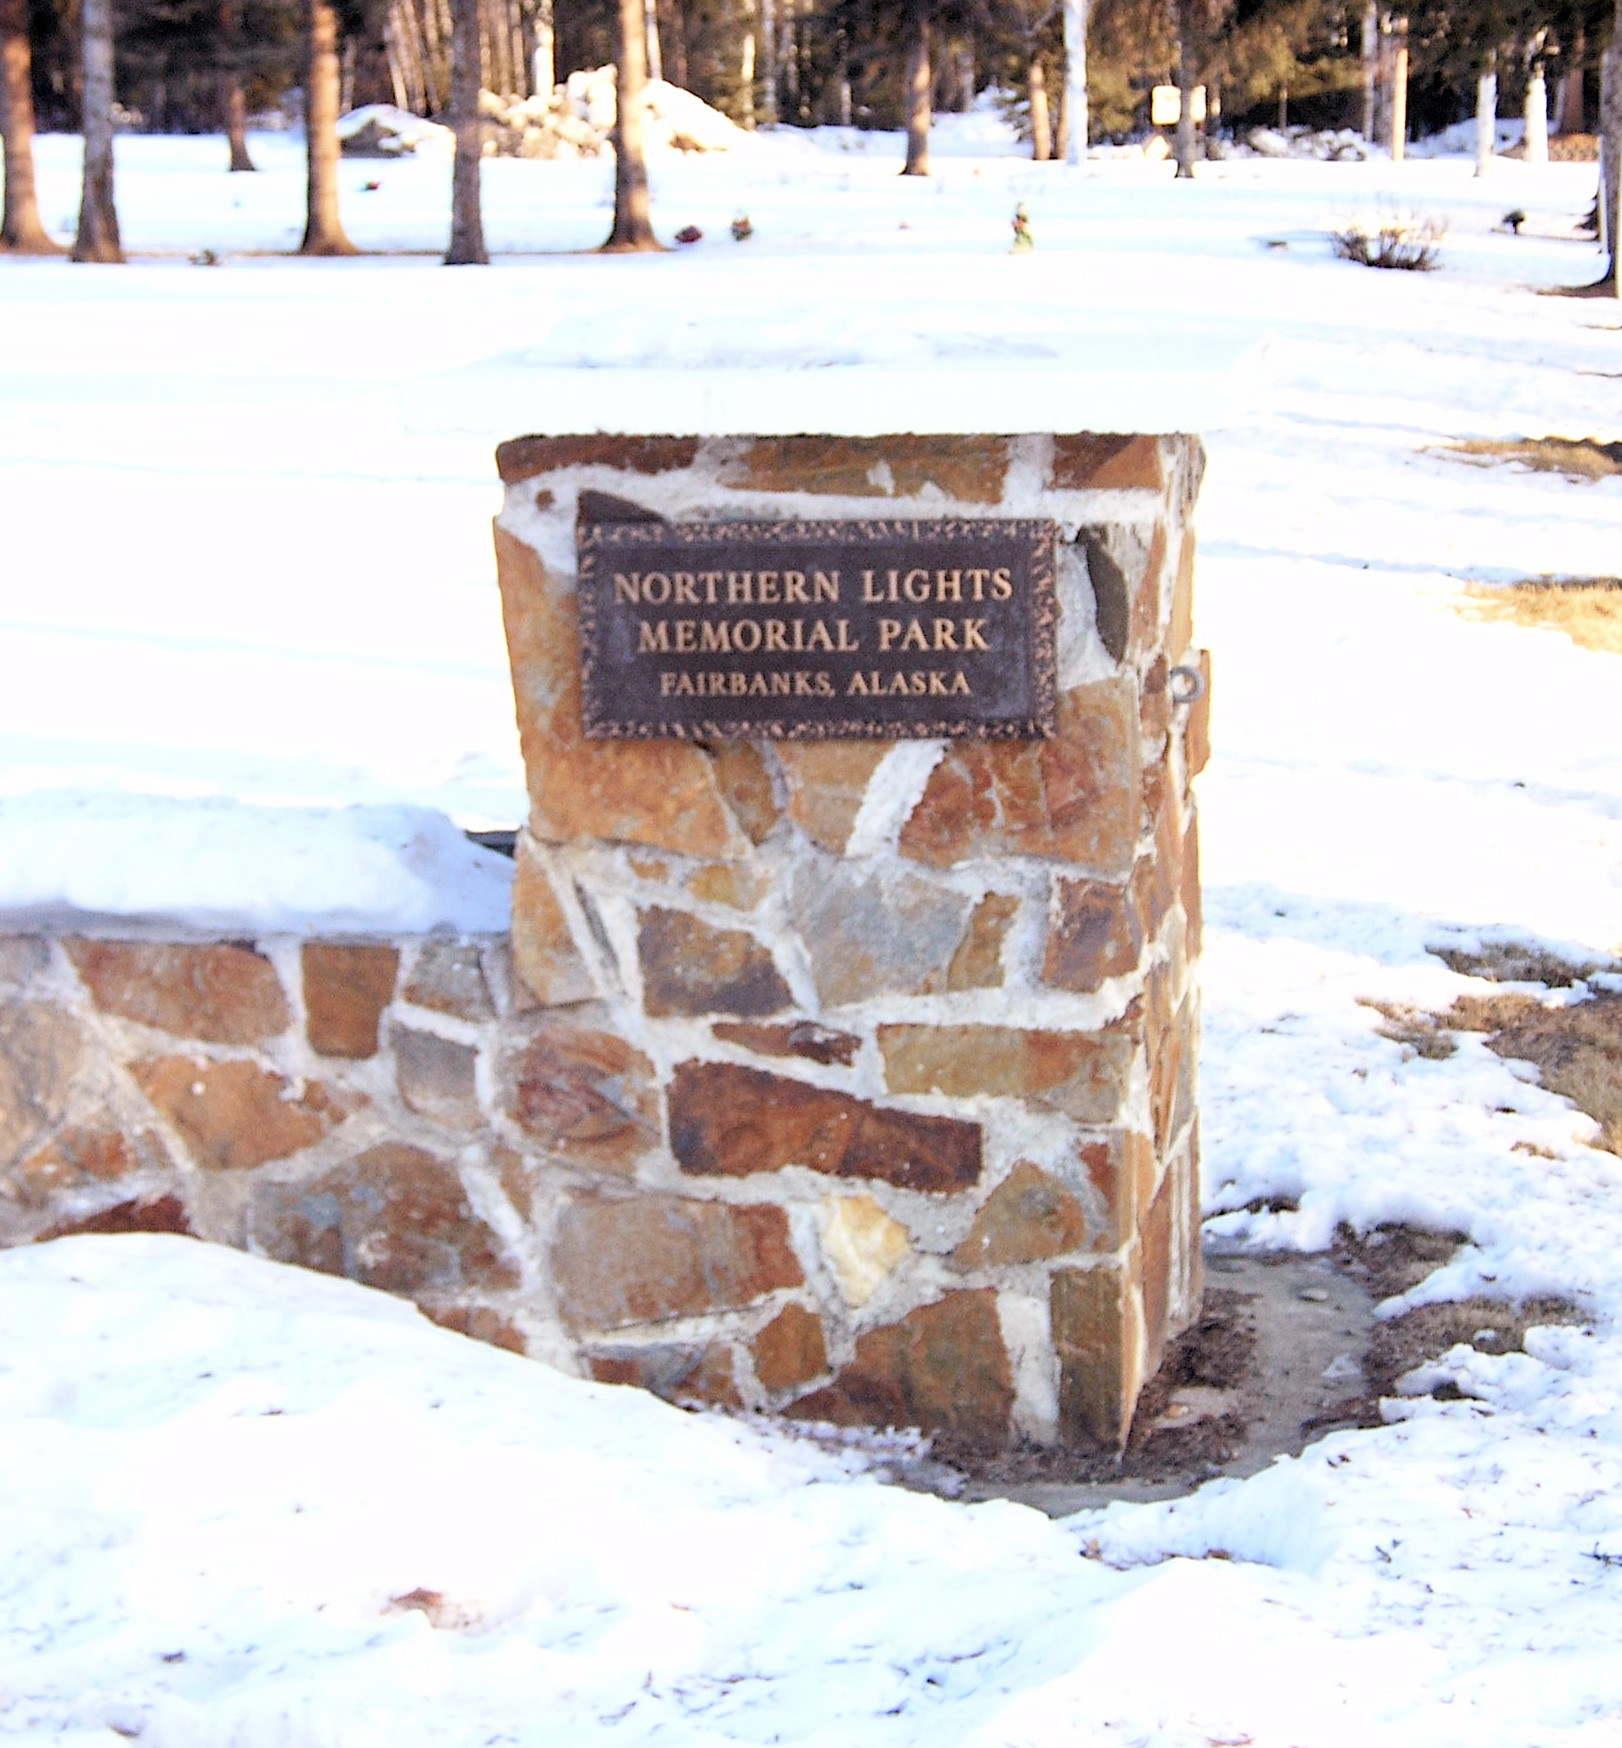 Northern Lights Memorial Cemetery